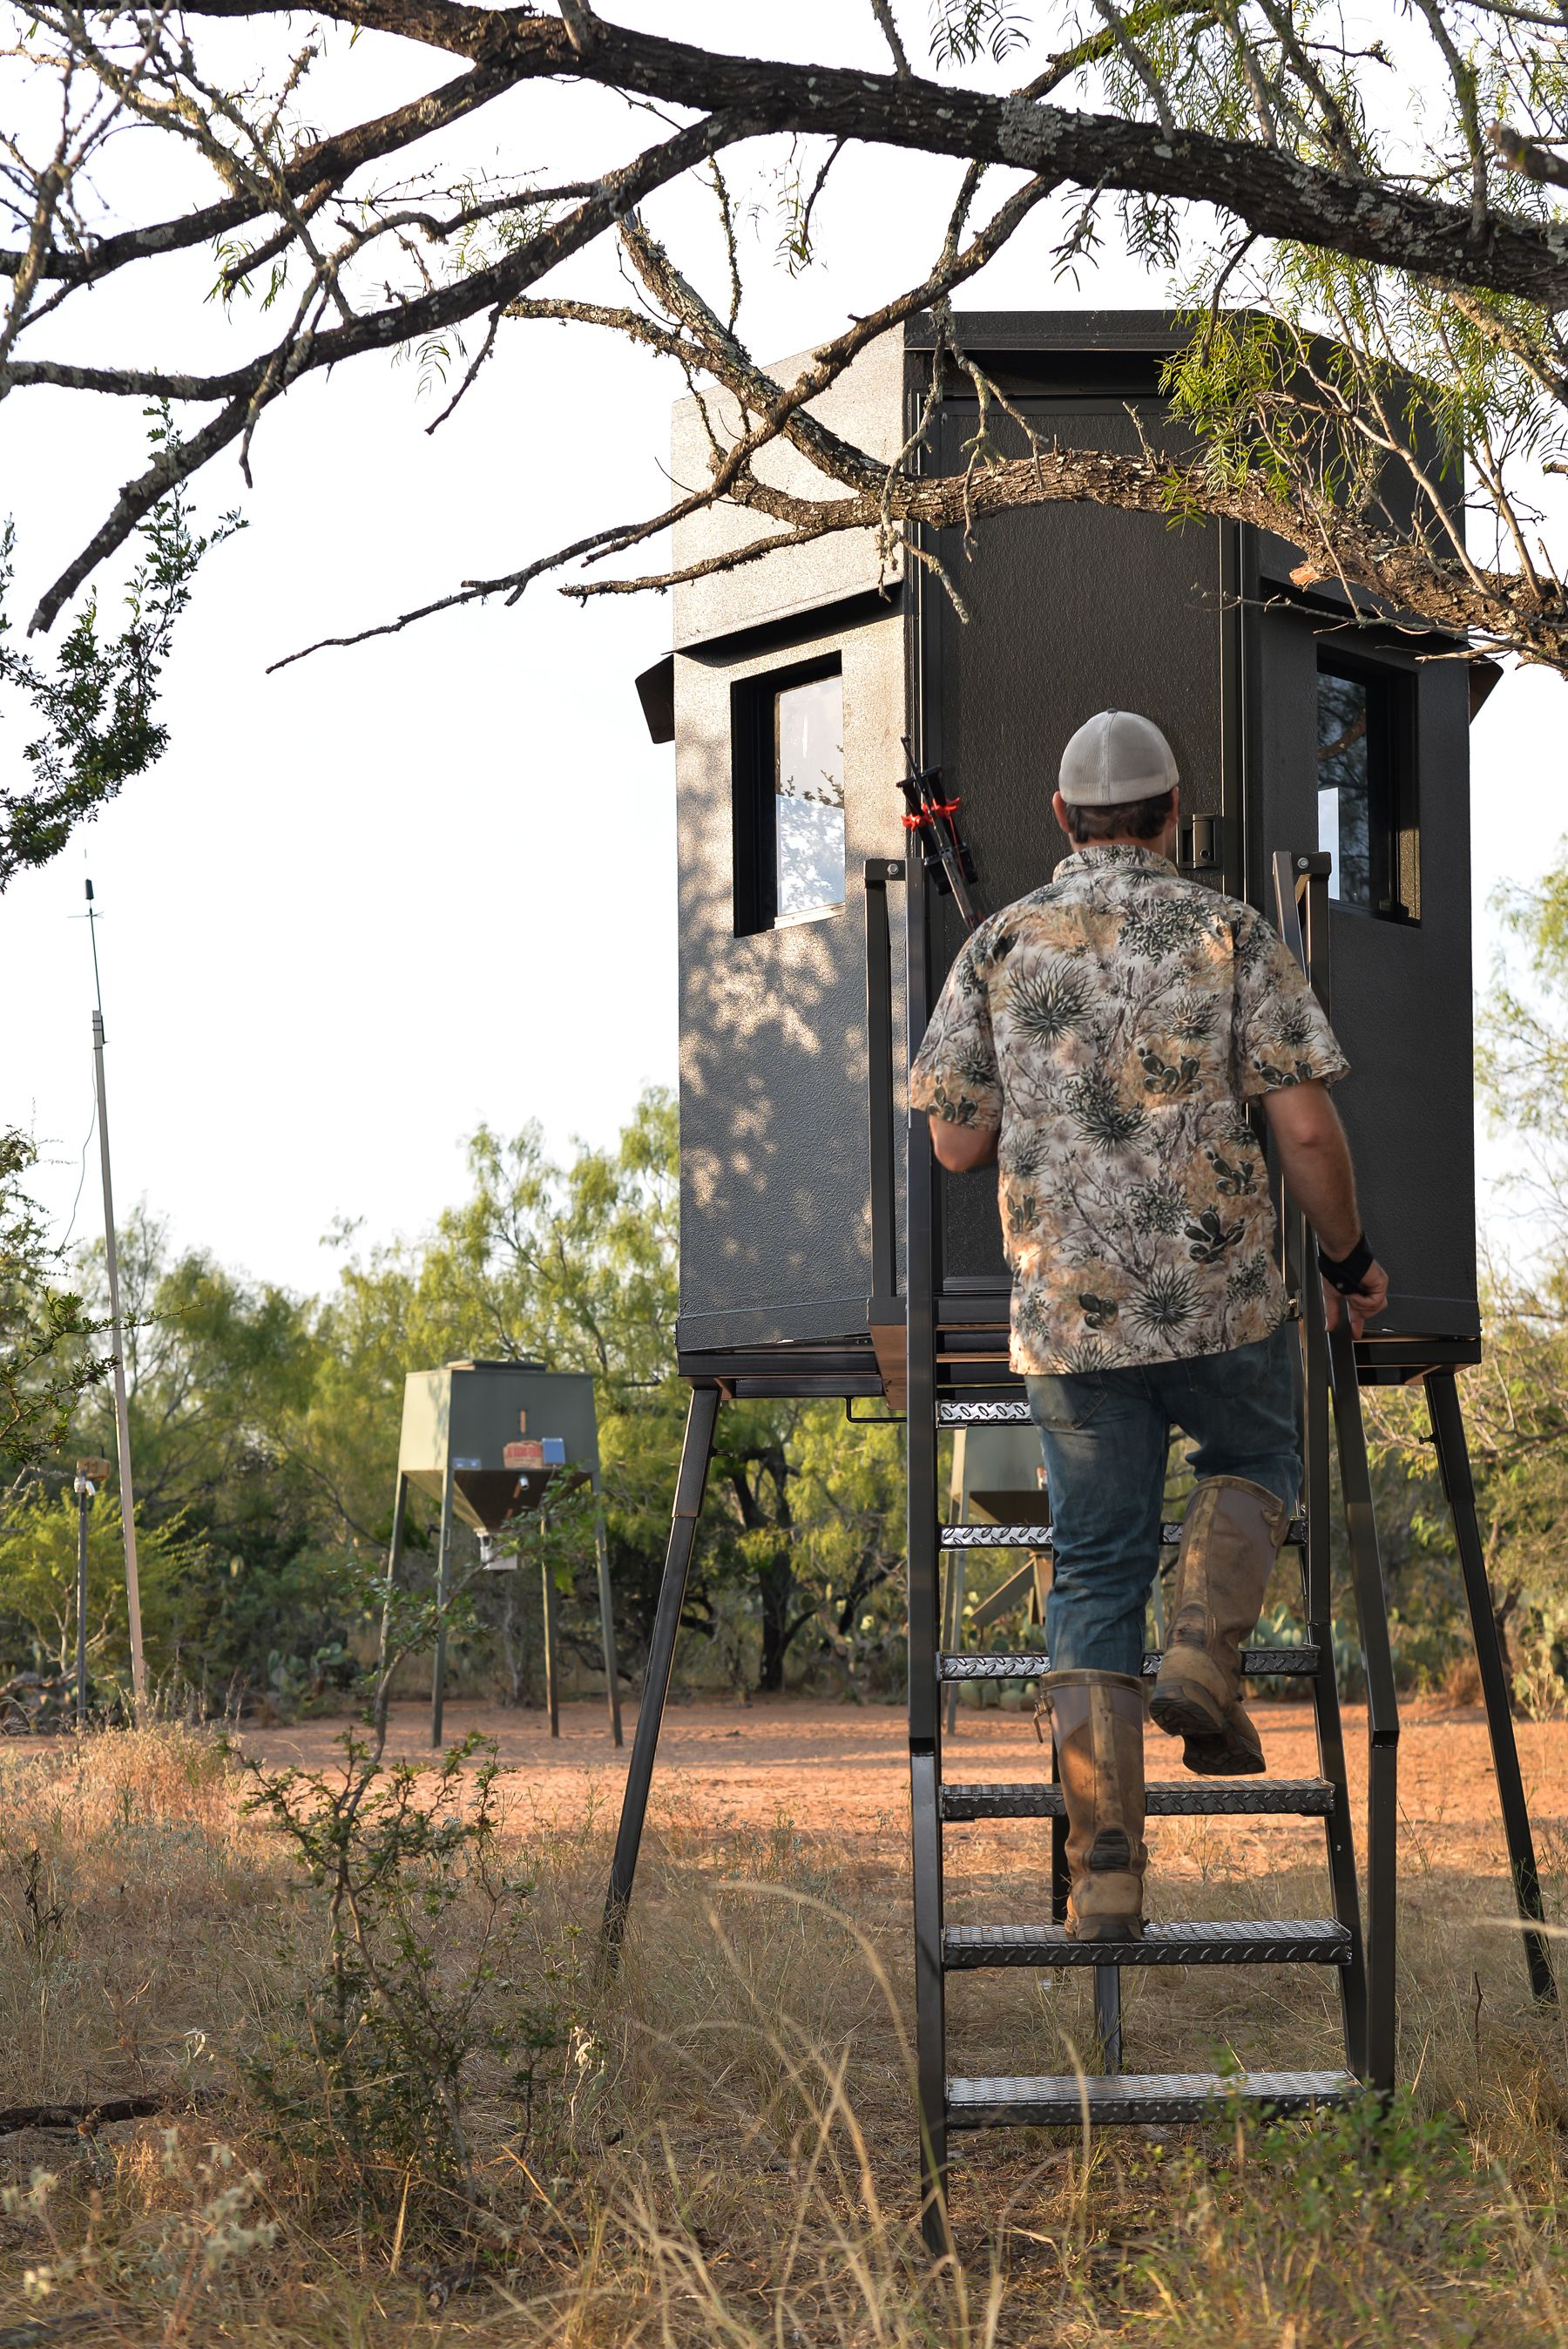 topics boss buck feeders ubbthreads image linked all deer feeder